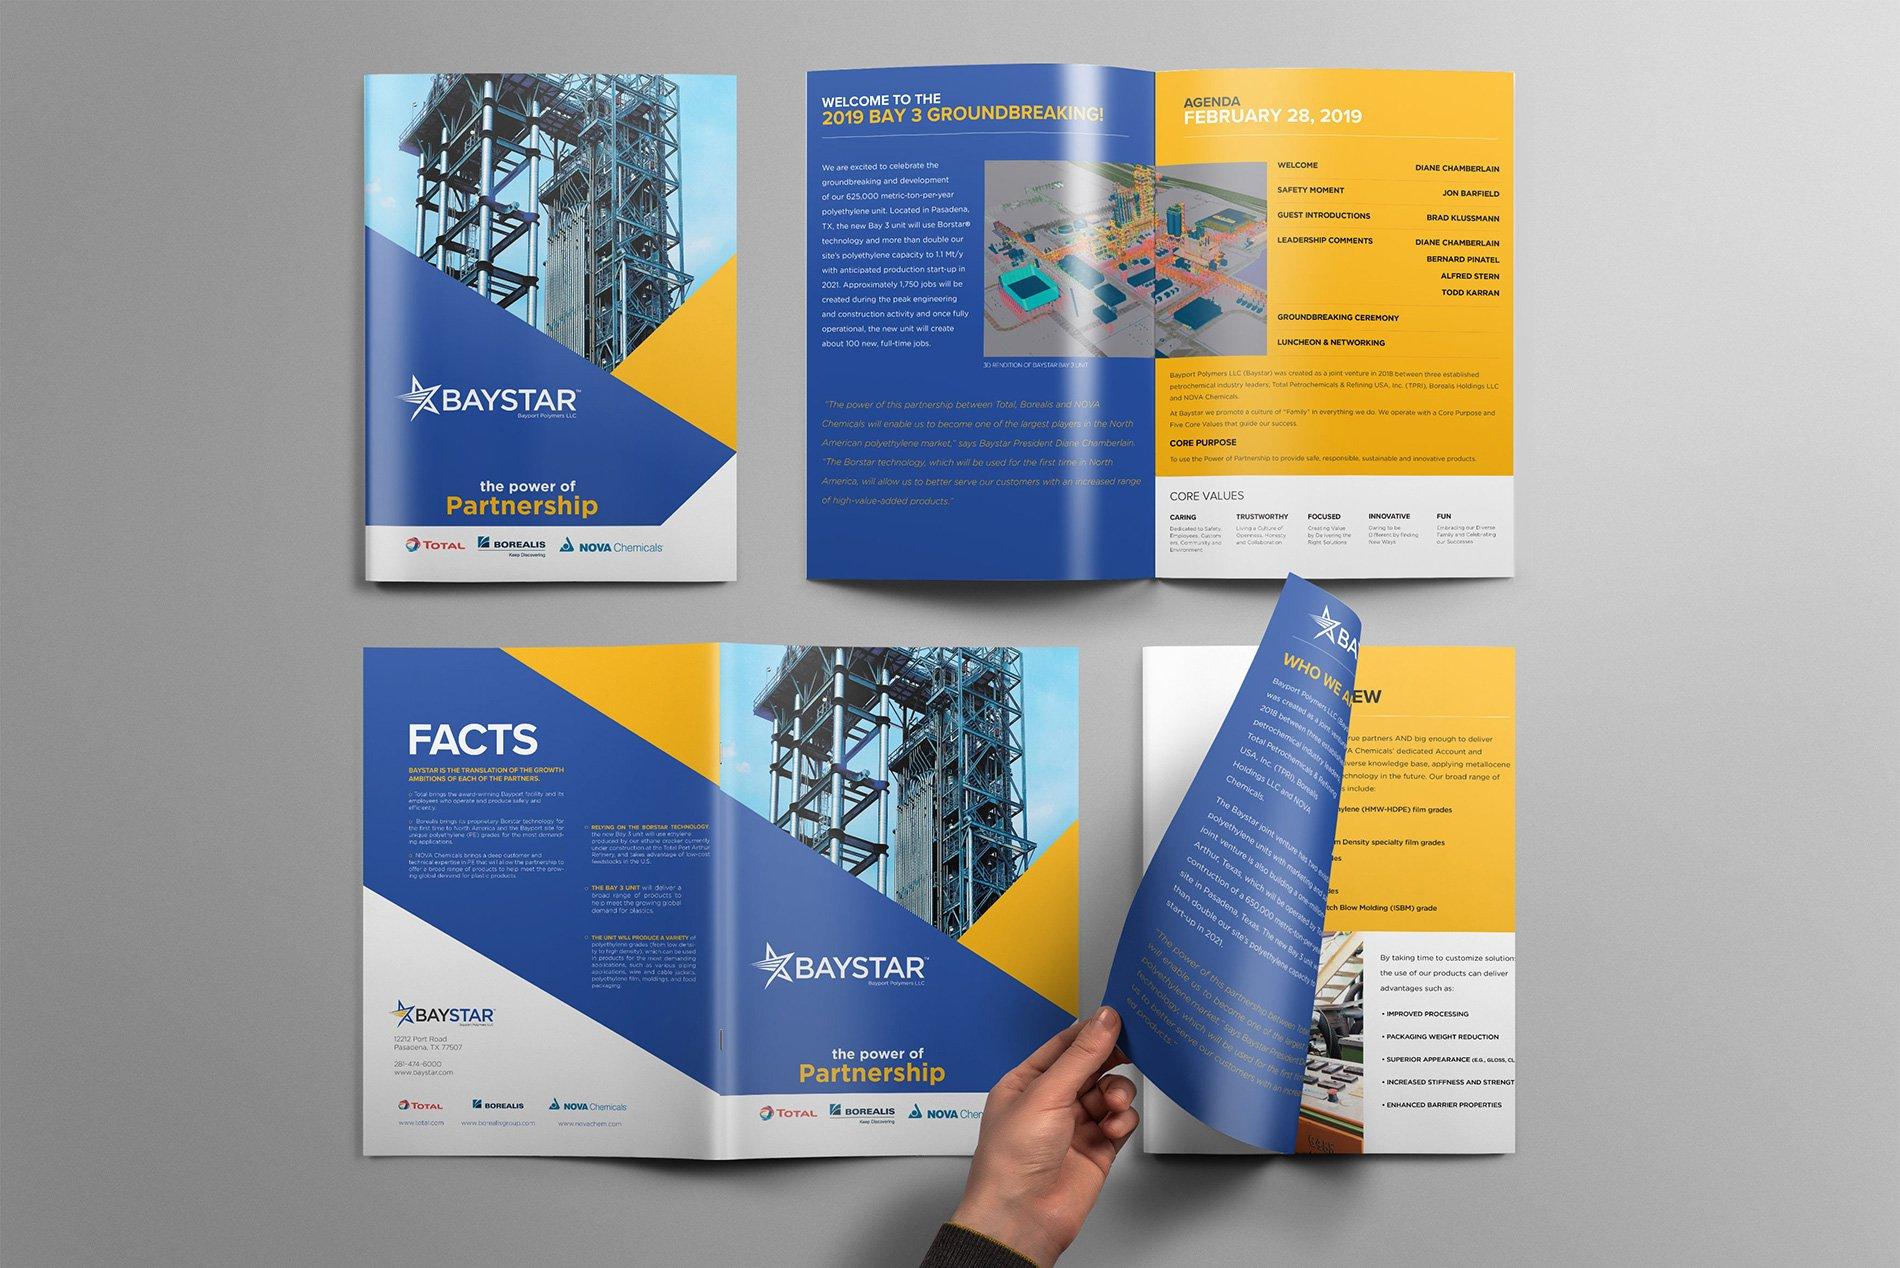 BayStar-brochure-a4-mockup